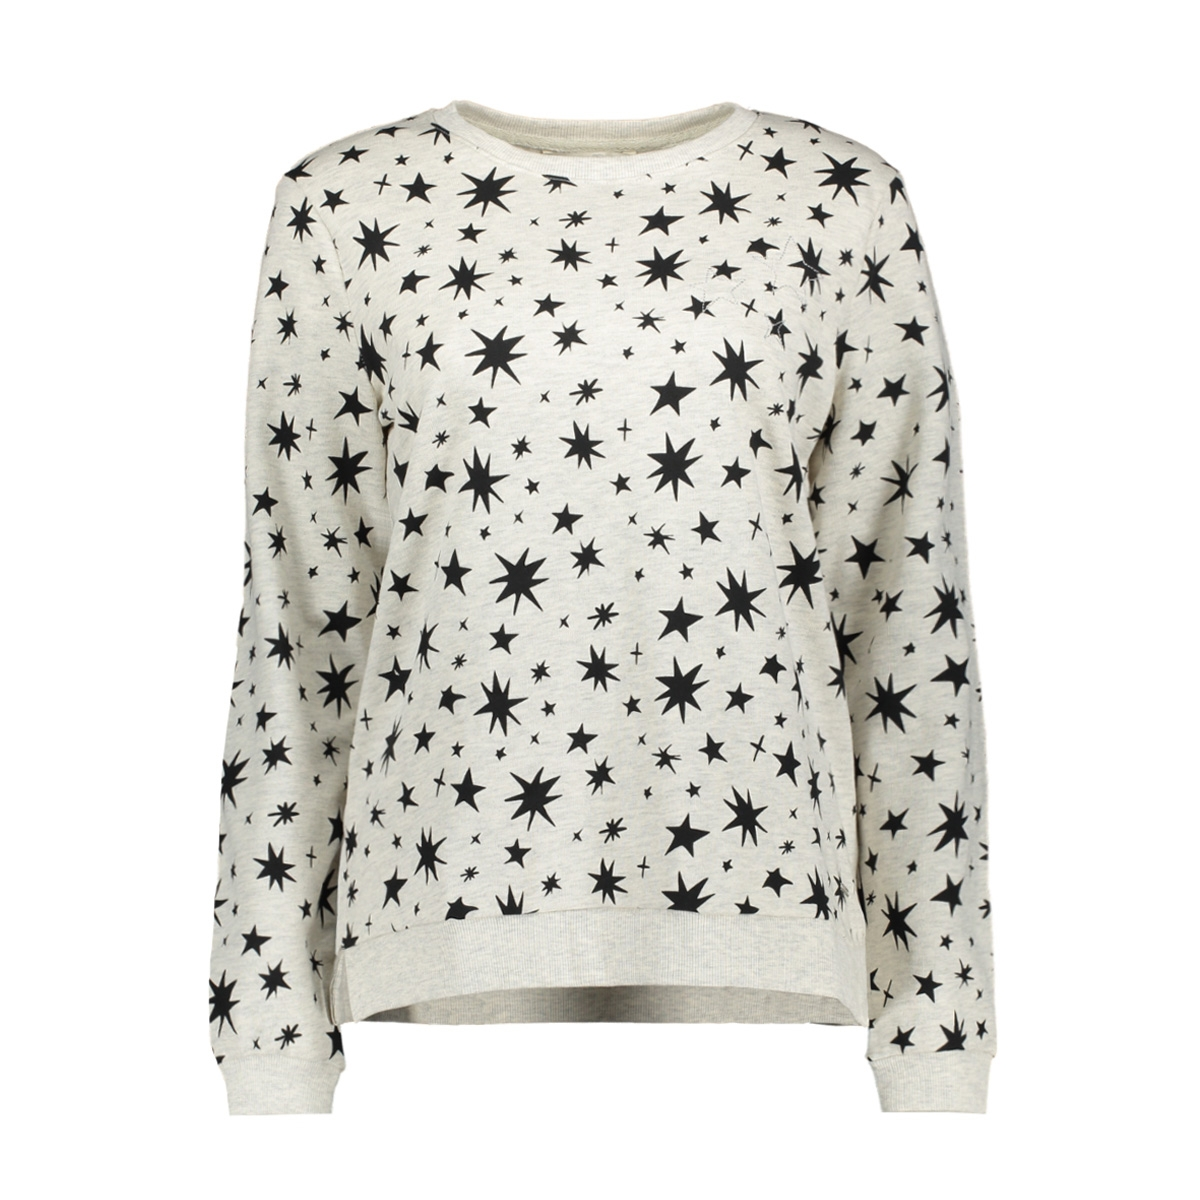 2555027.00.71 tom tailor sweater 8425